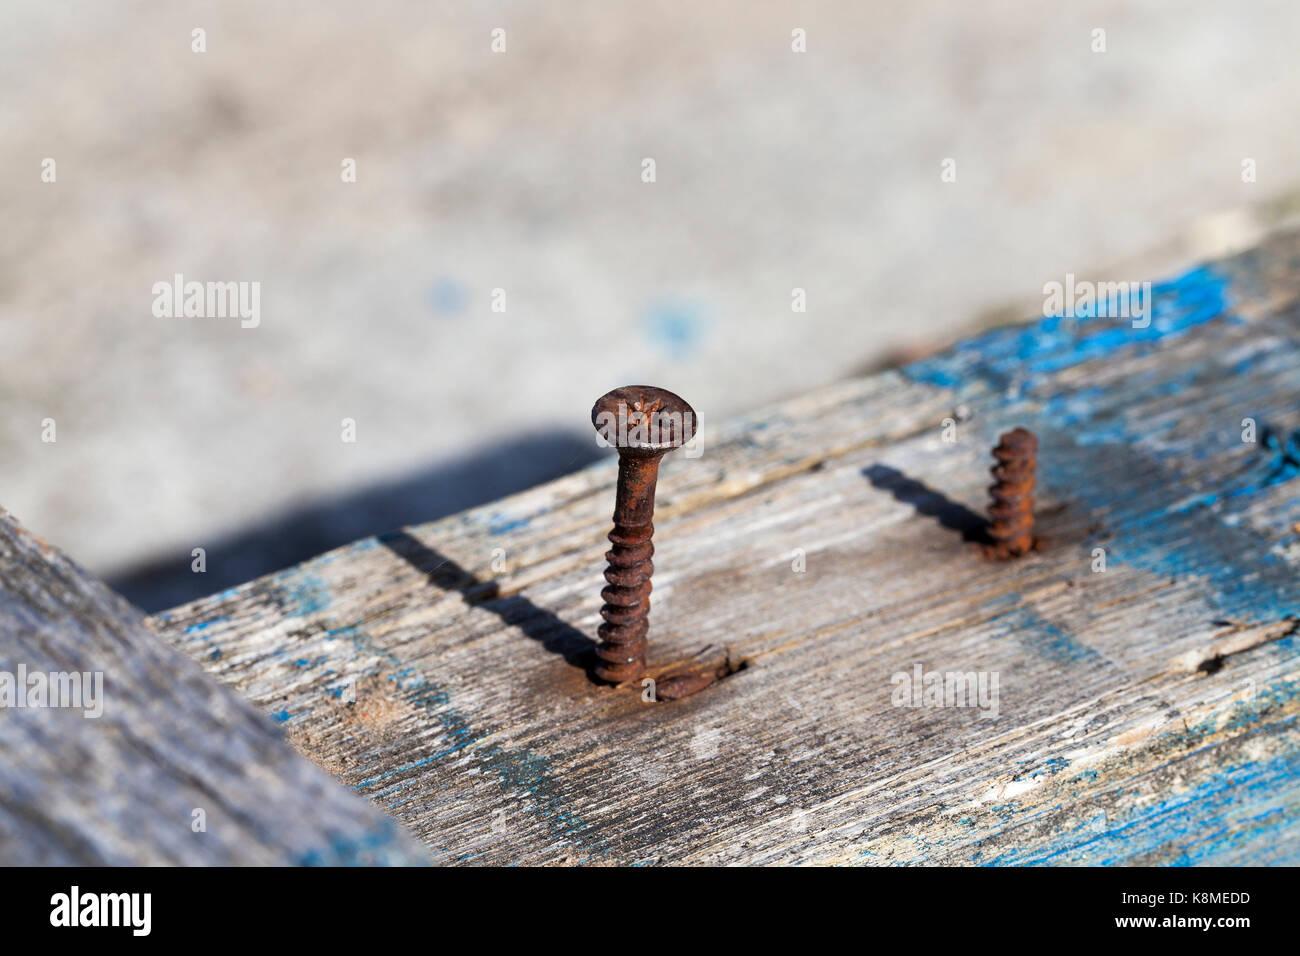 Rusty Hardware Nails